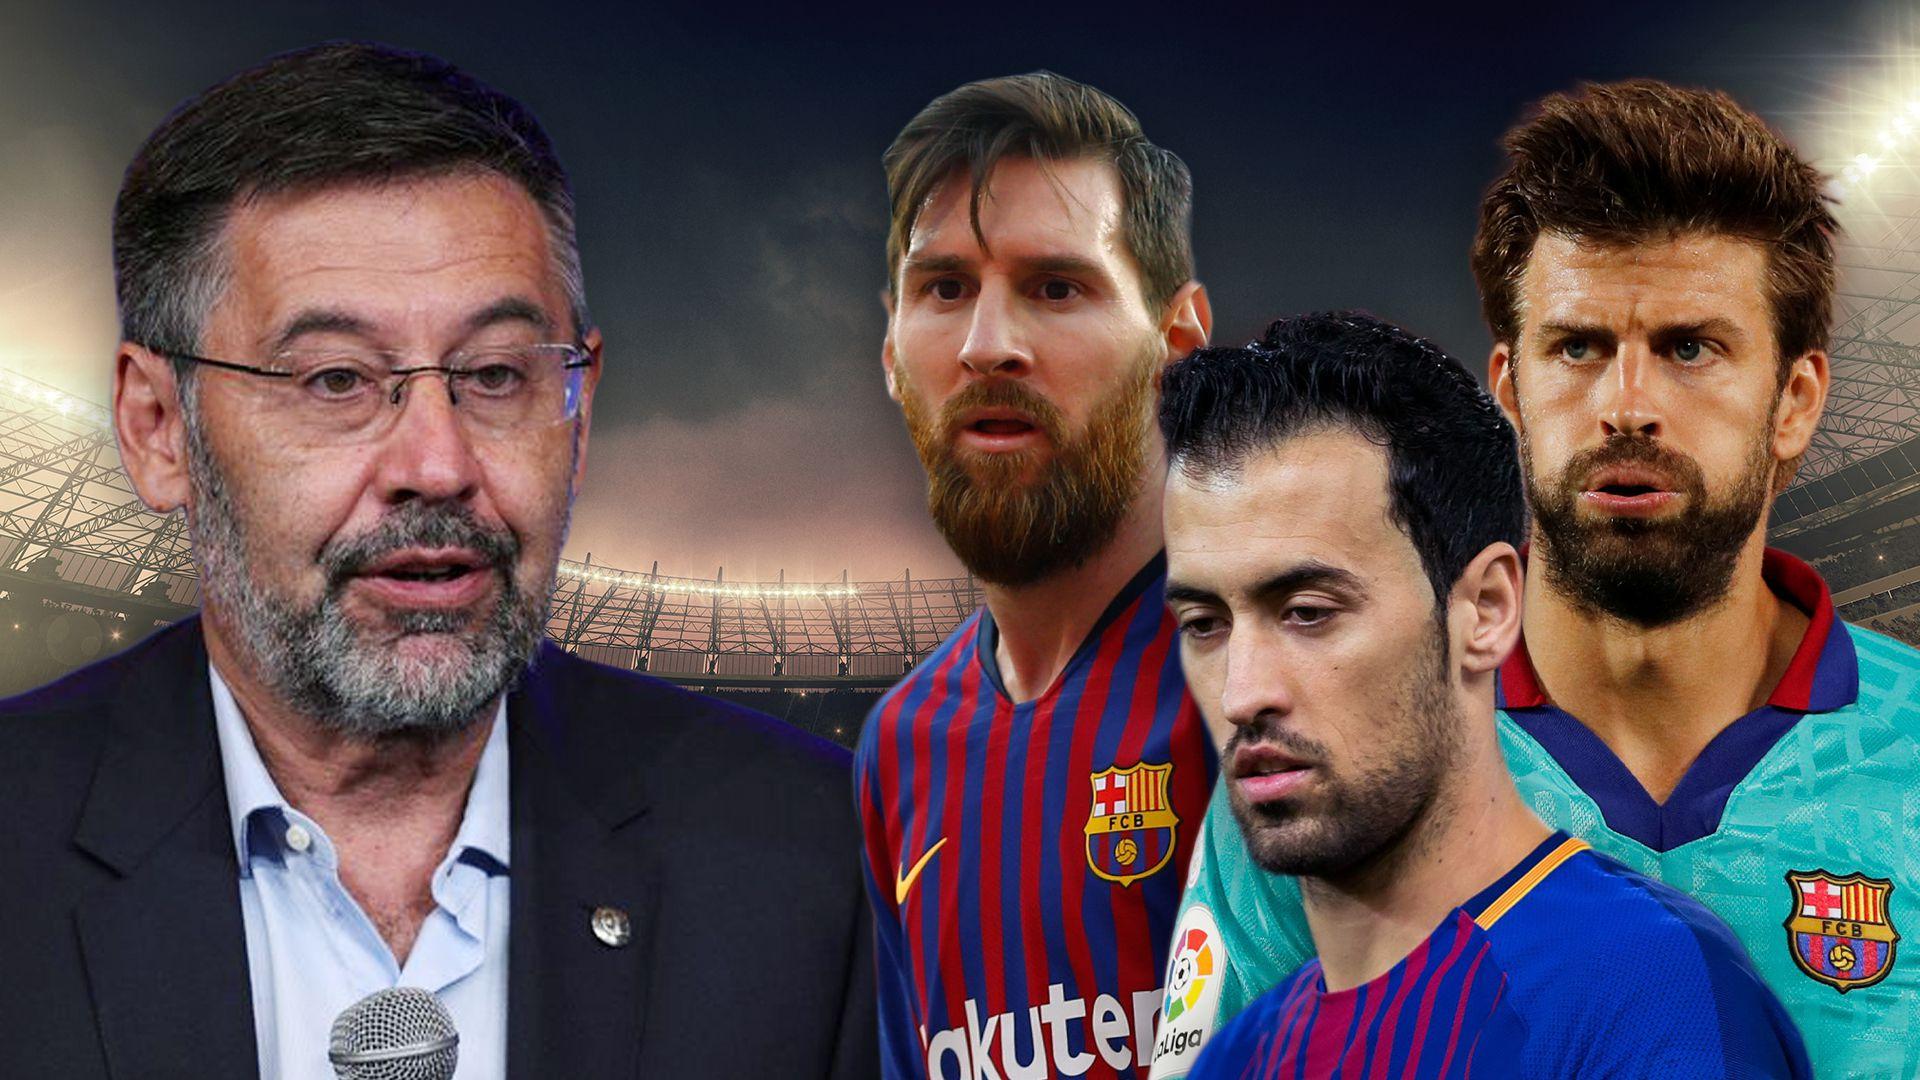 Josep Maria Bartomeu Messi, Piqué y Busquets